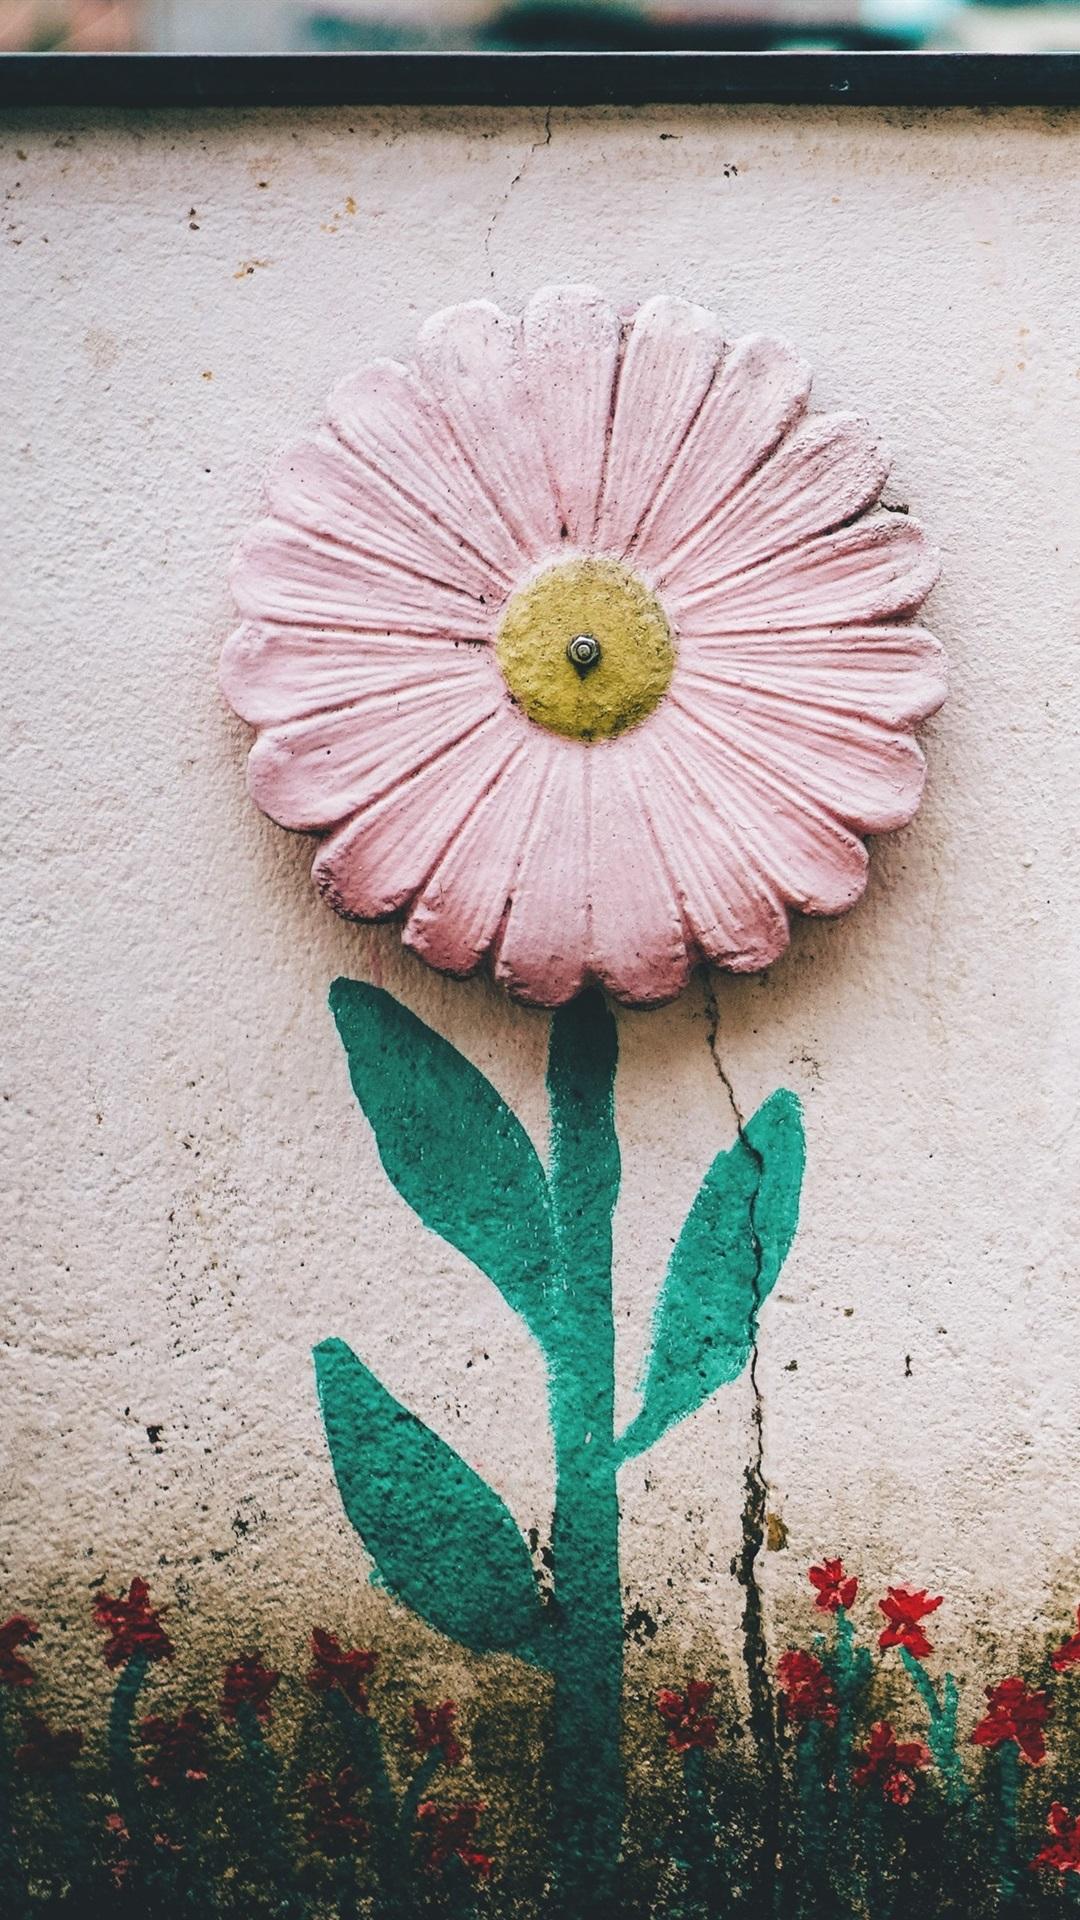 ed18db8ce4d Fondos de pantalla Pared, flor, pintura 3840x2160 UHD 4K Imagen